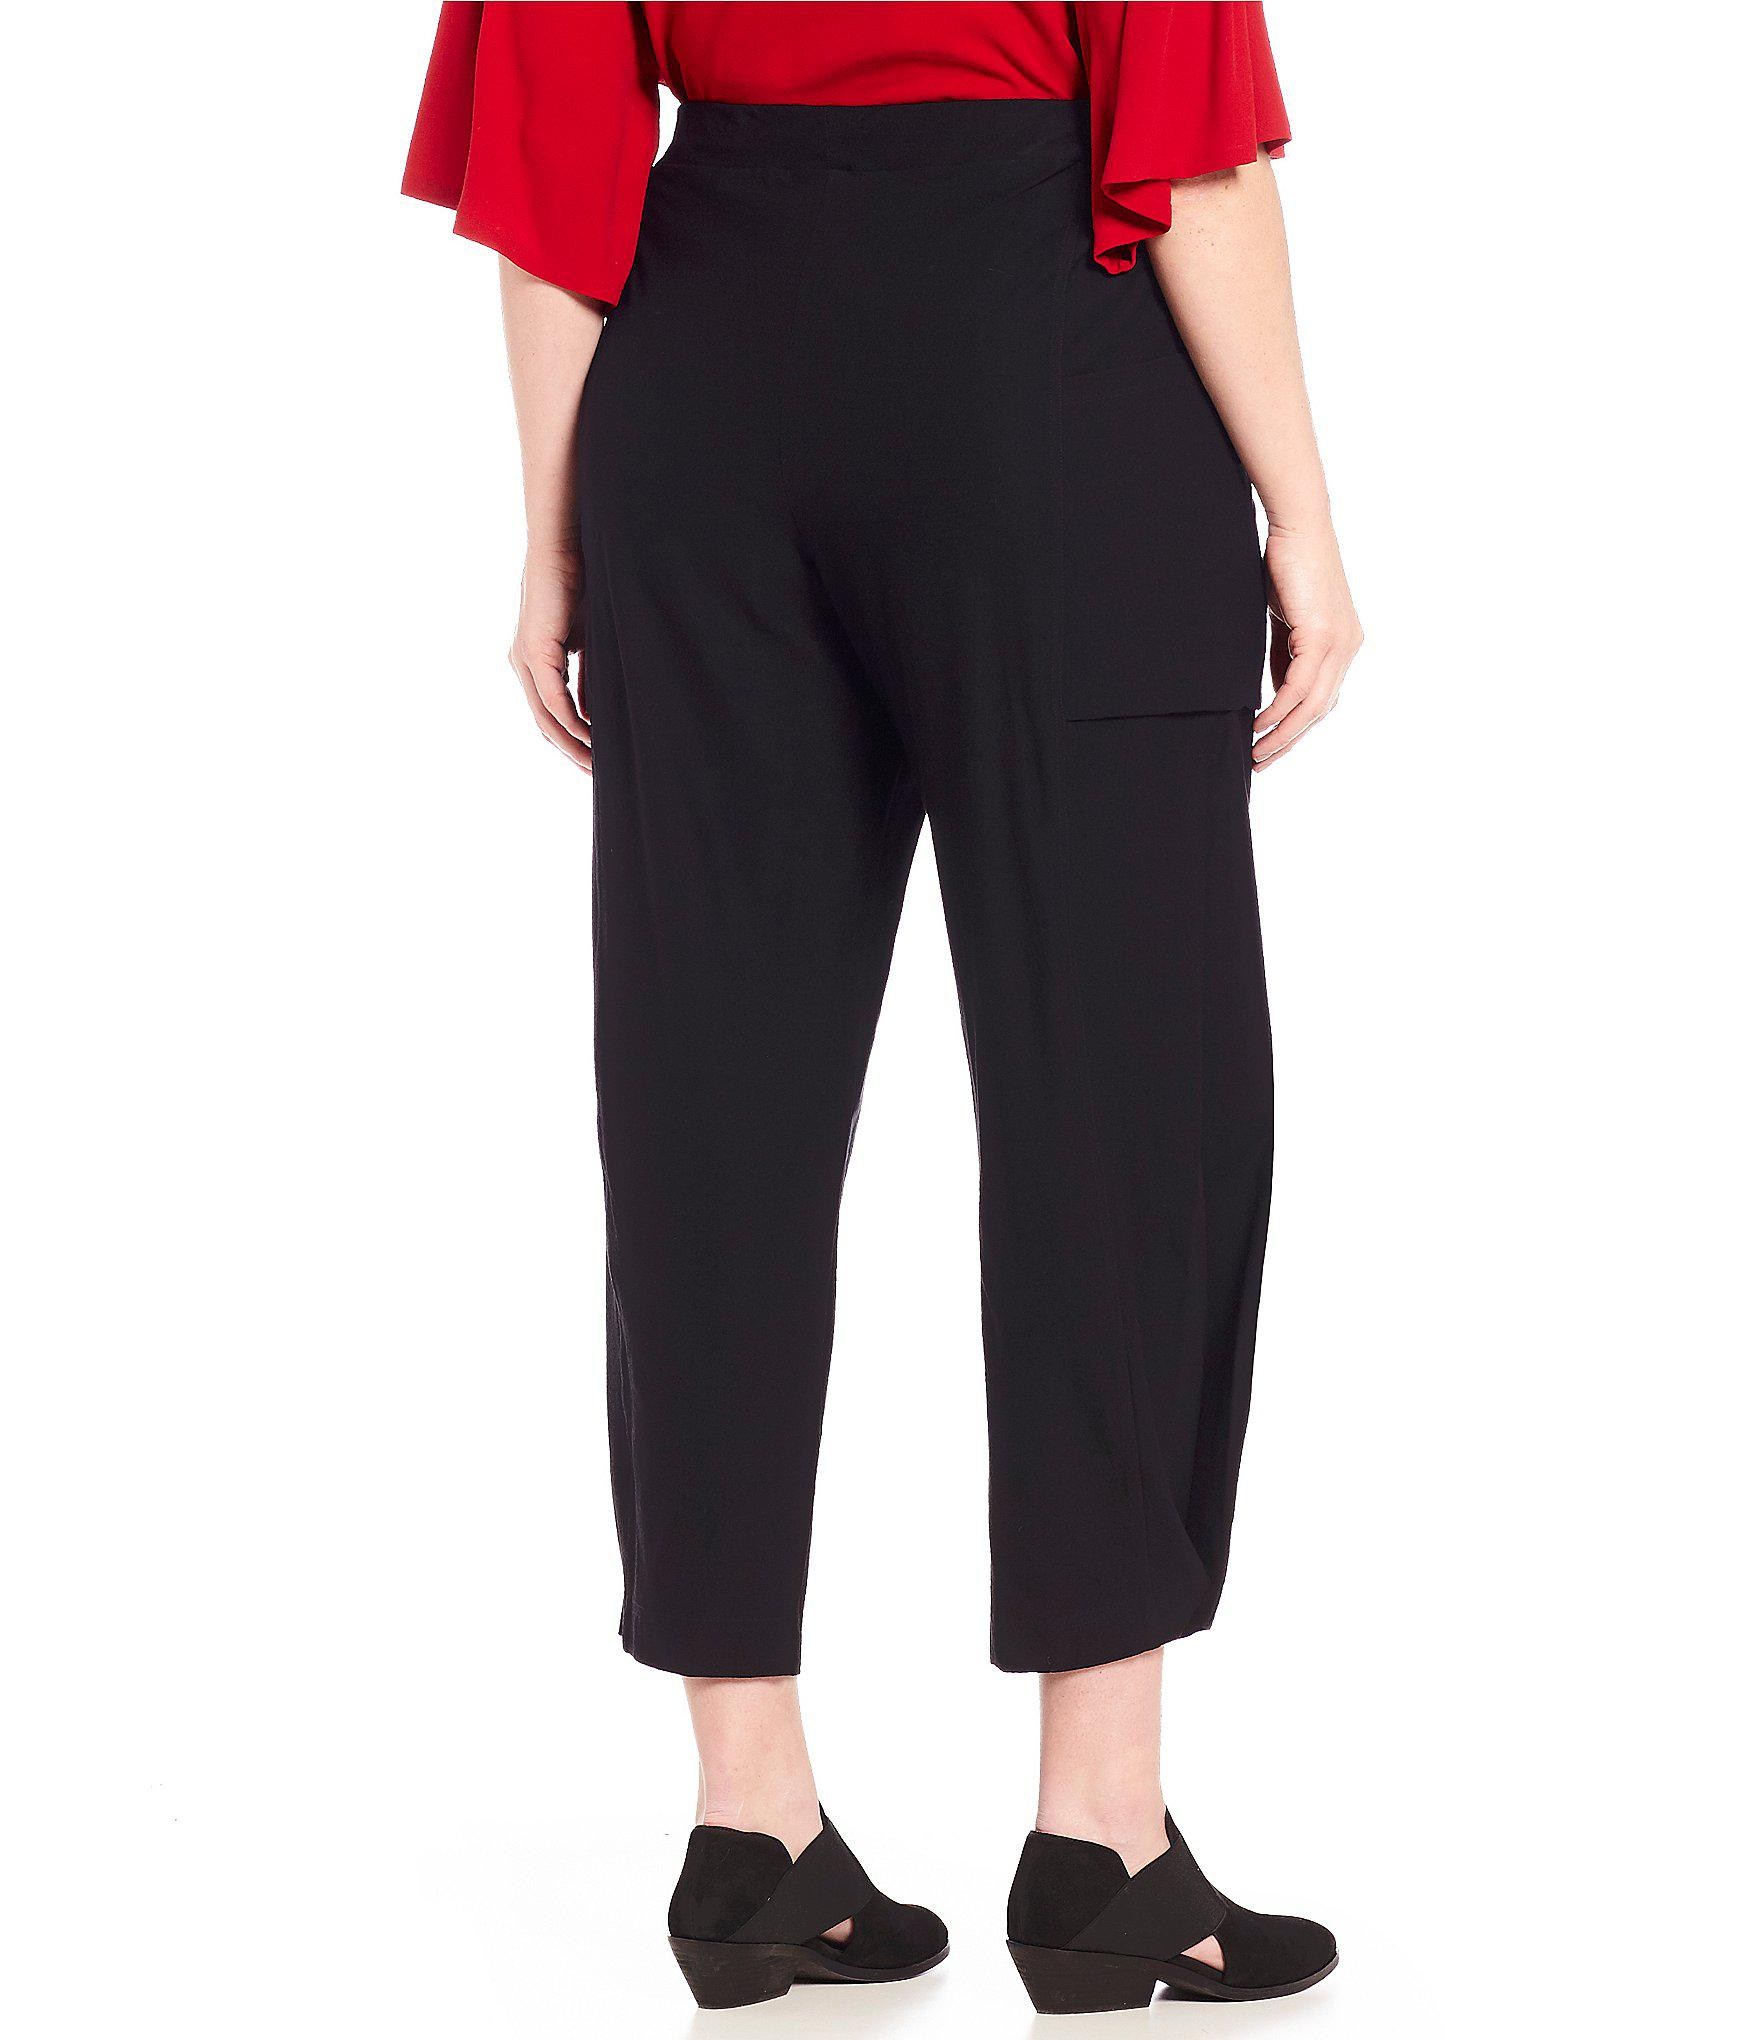 fbf0bddc129 Lyst - Eileen Fisher Plus Size Ankle Pull-on Pants in Black